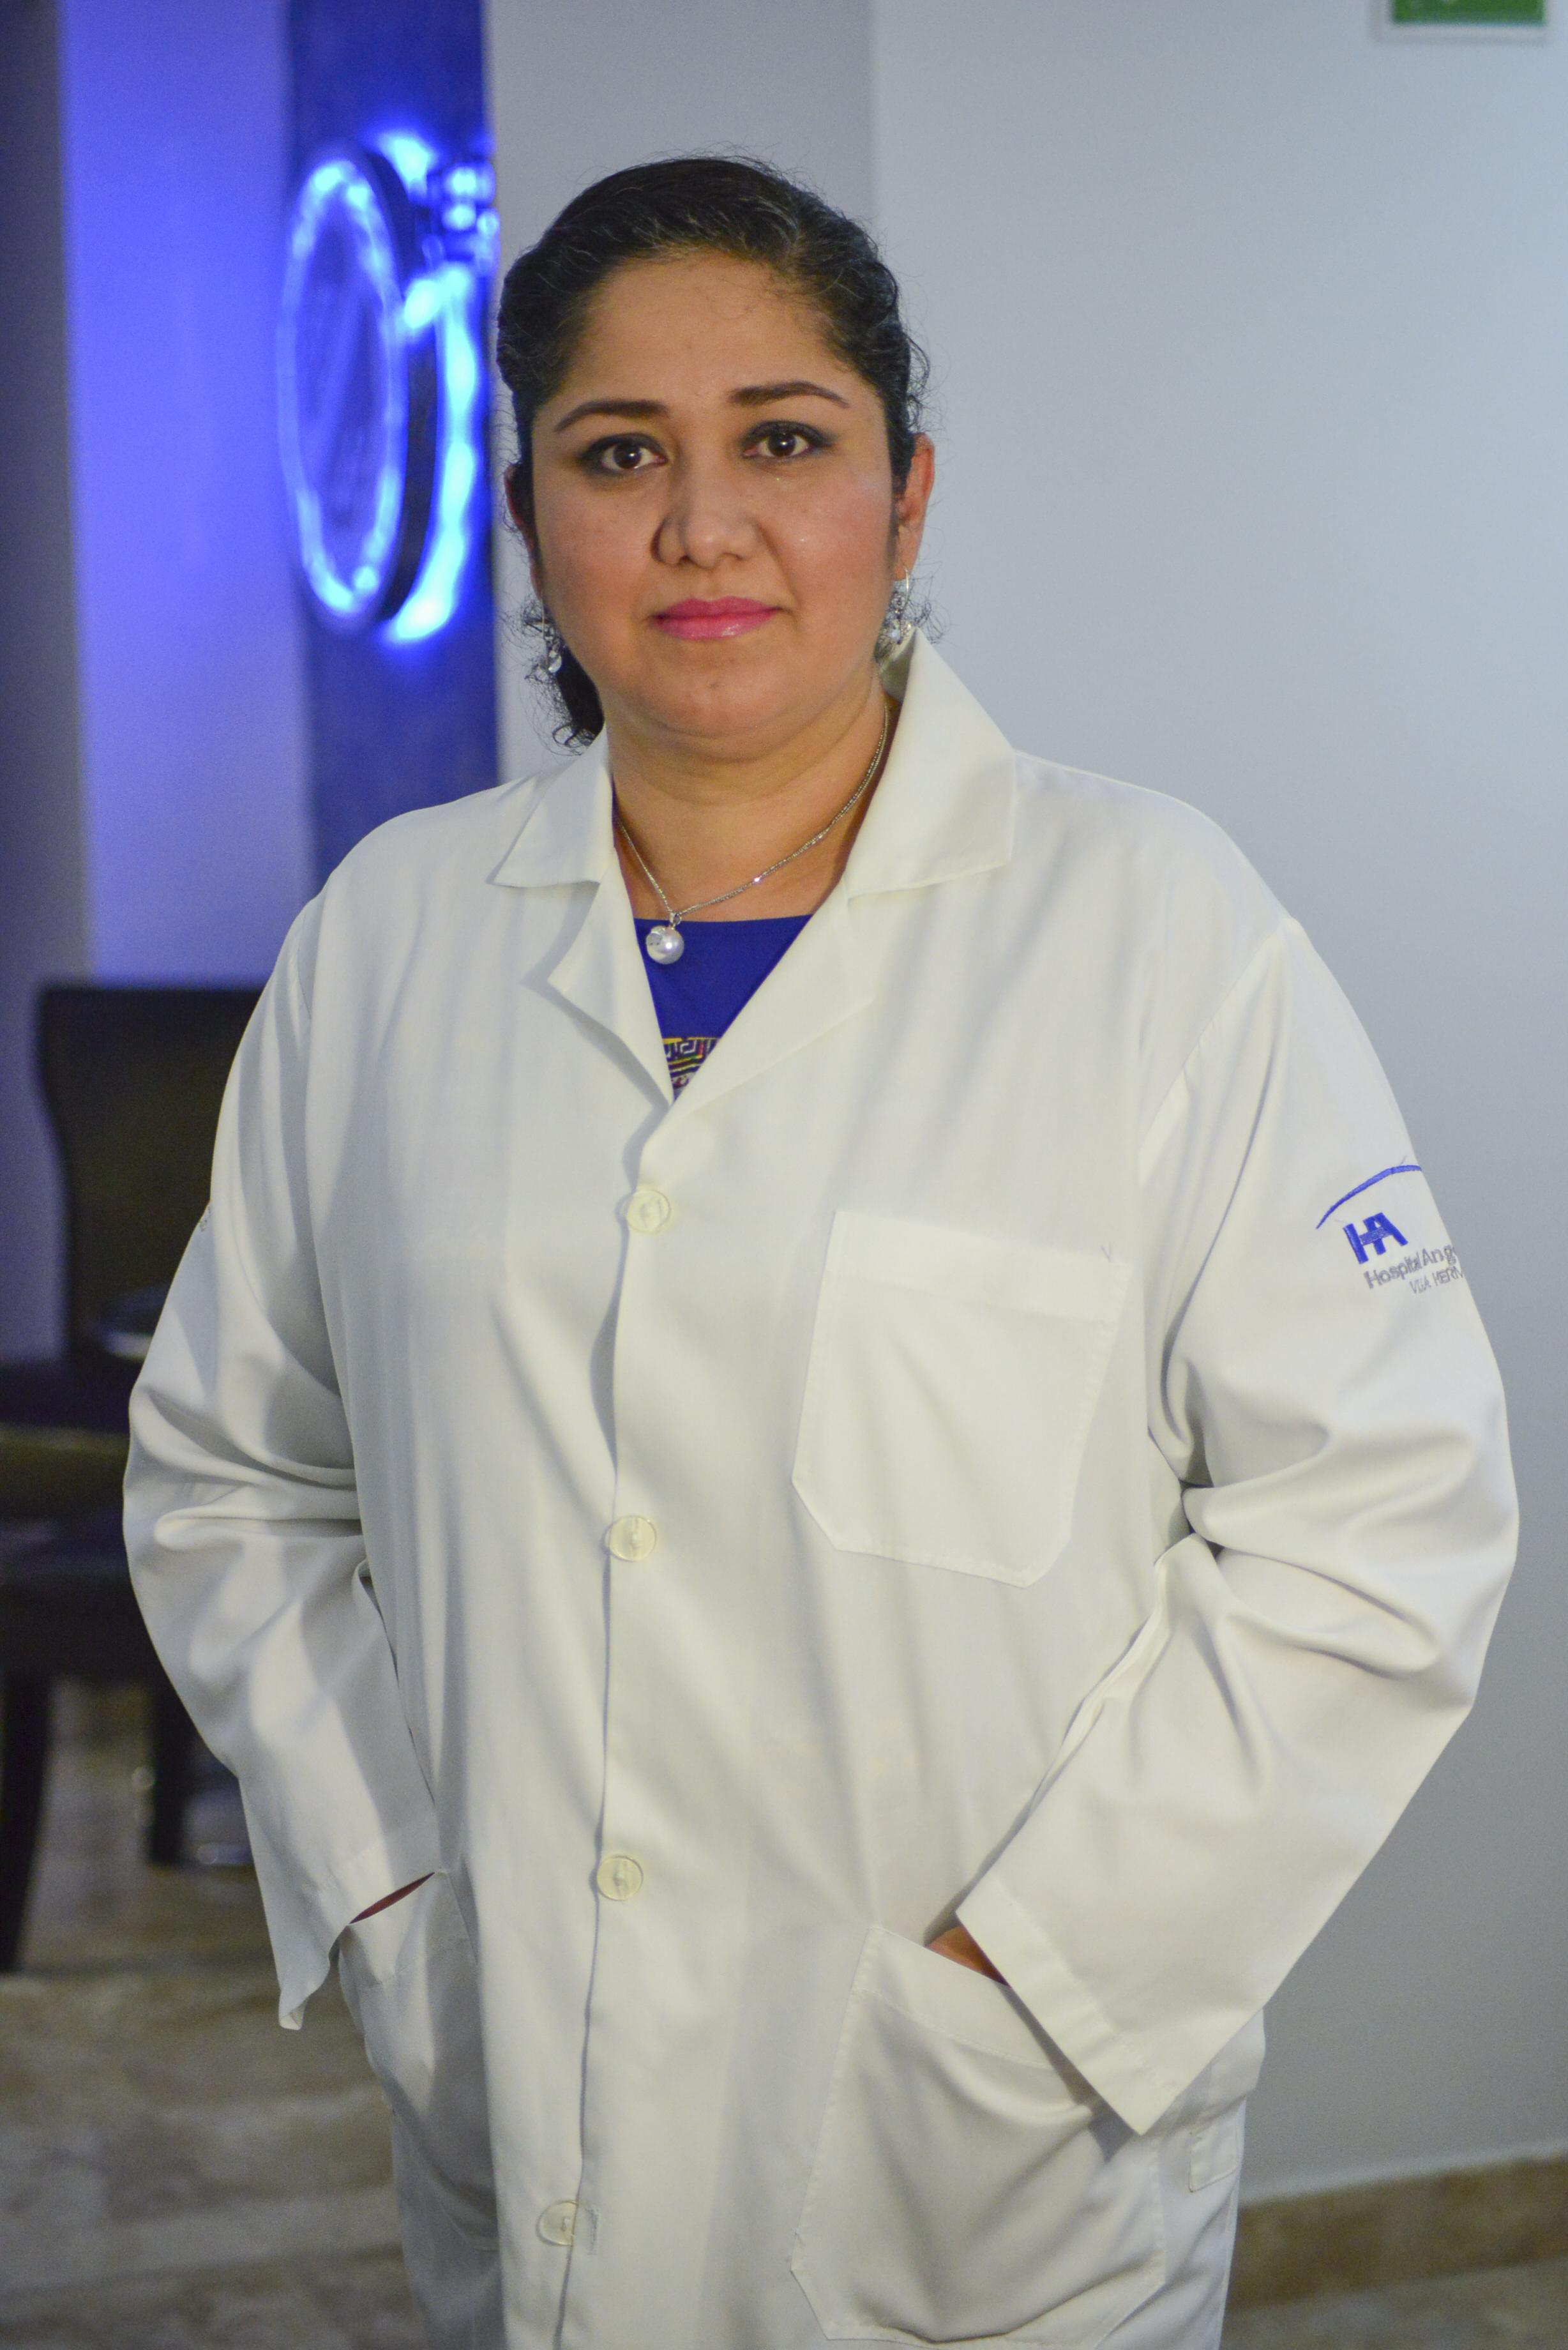 Dra. Norma Turren